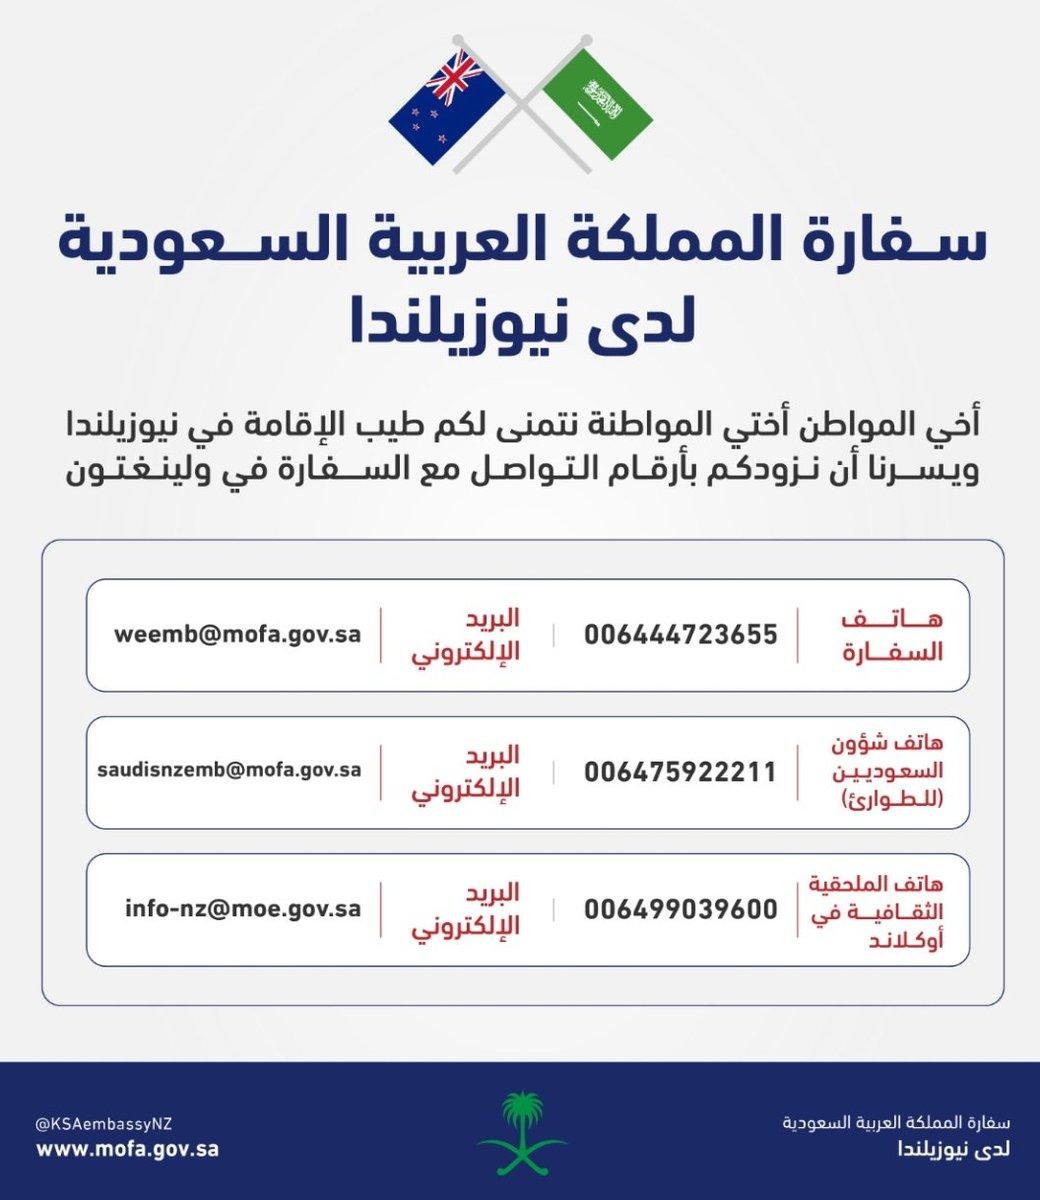 Saudi Embassy In New Zealand Ksaembassynz Twitter